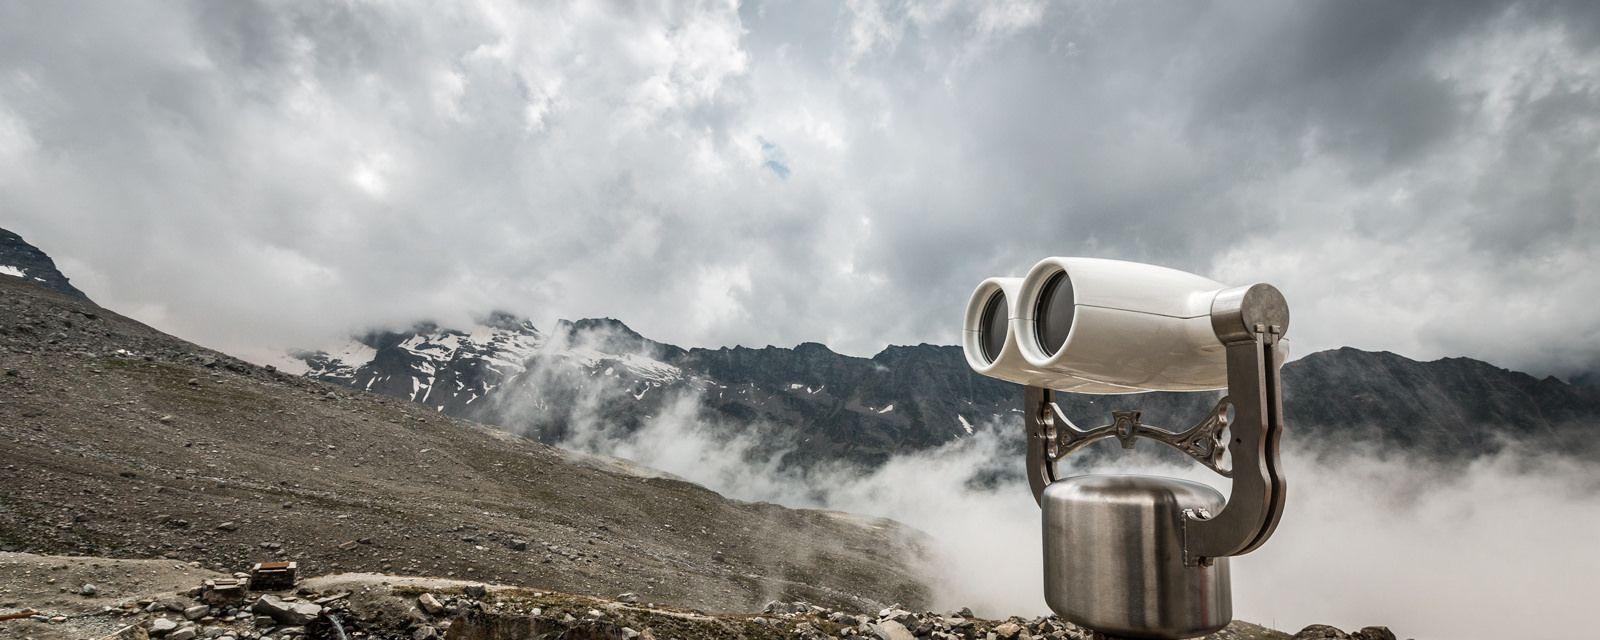 Preferiti di Vellardi Binocoli e Cannocchiali Panoramici per Turisti.